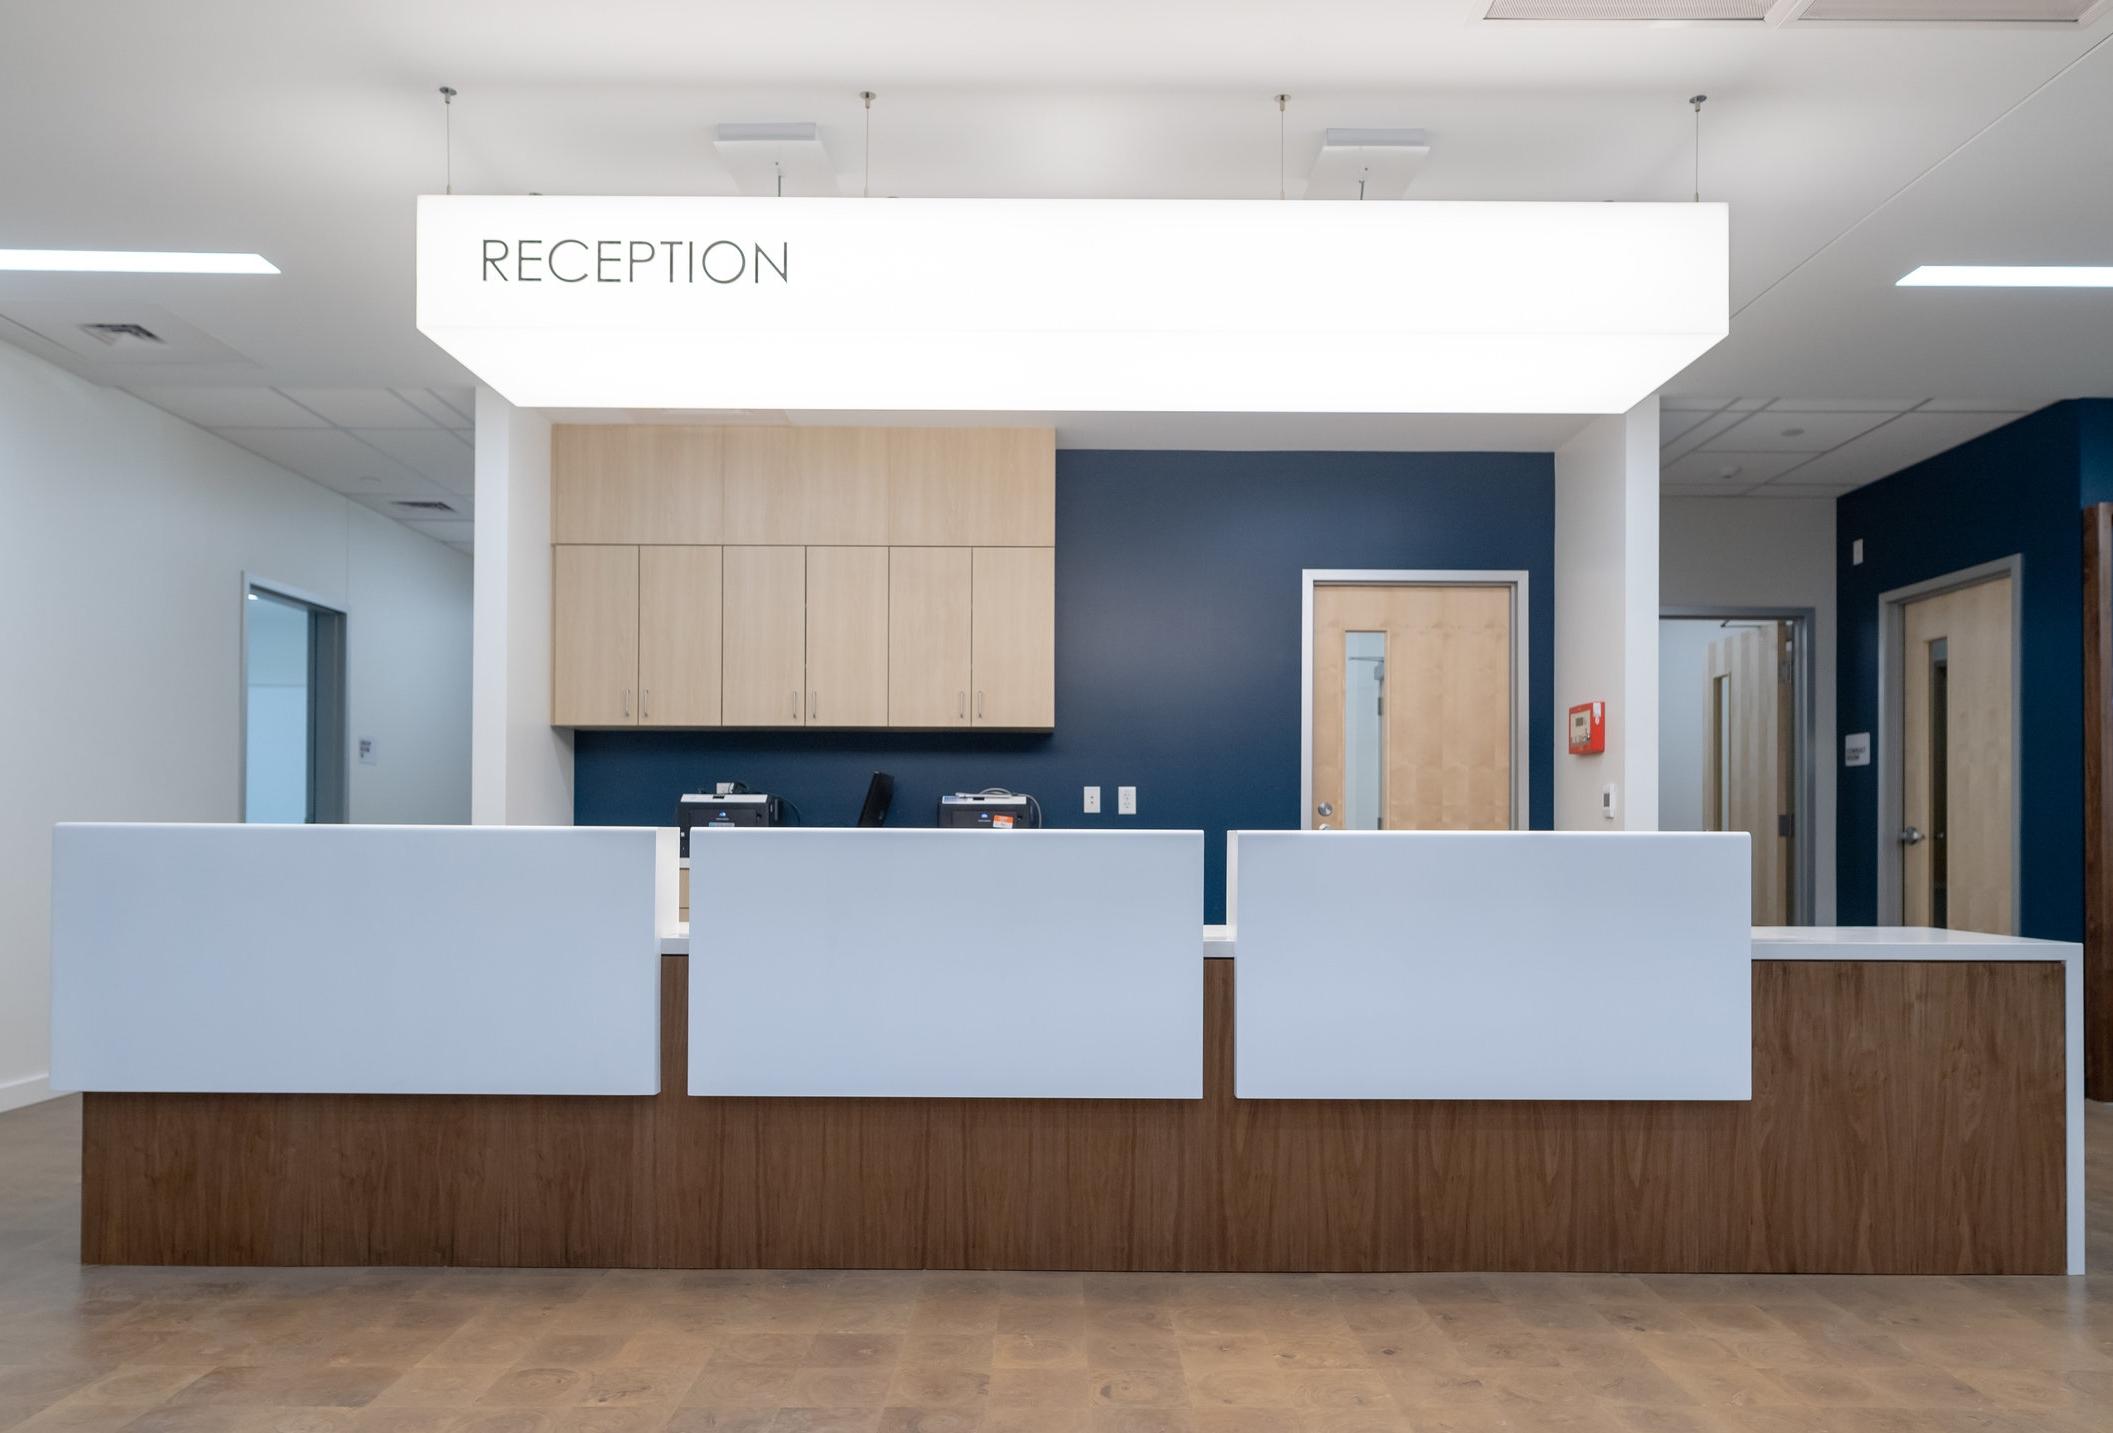 Garlington Health Center